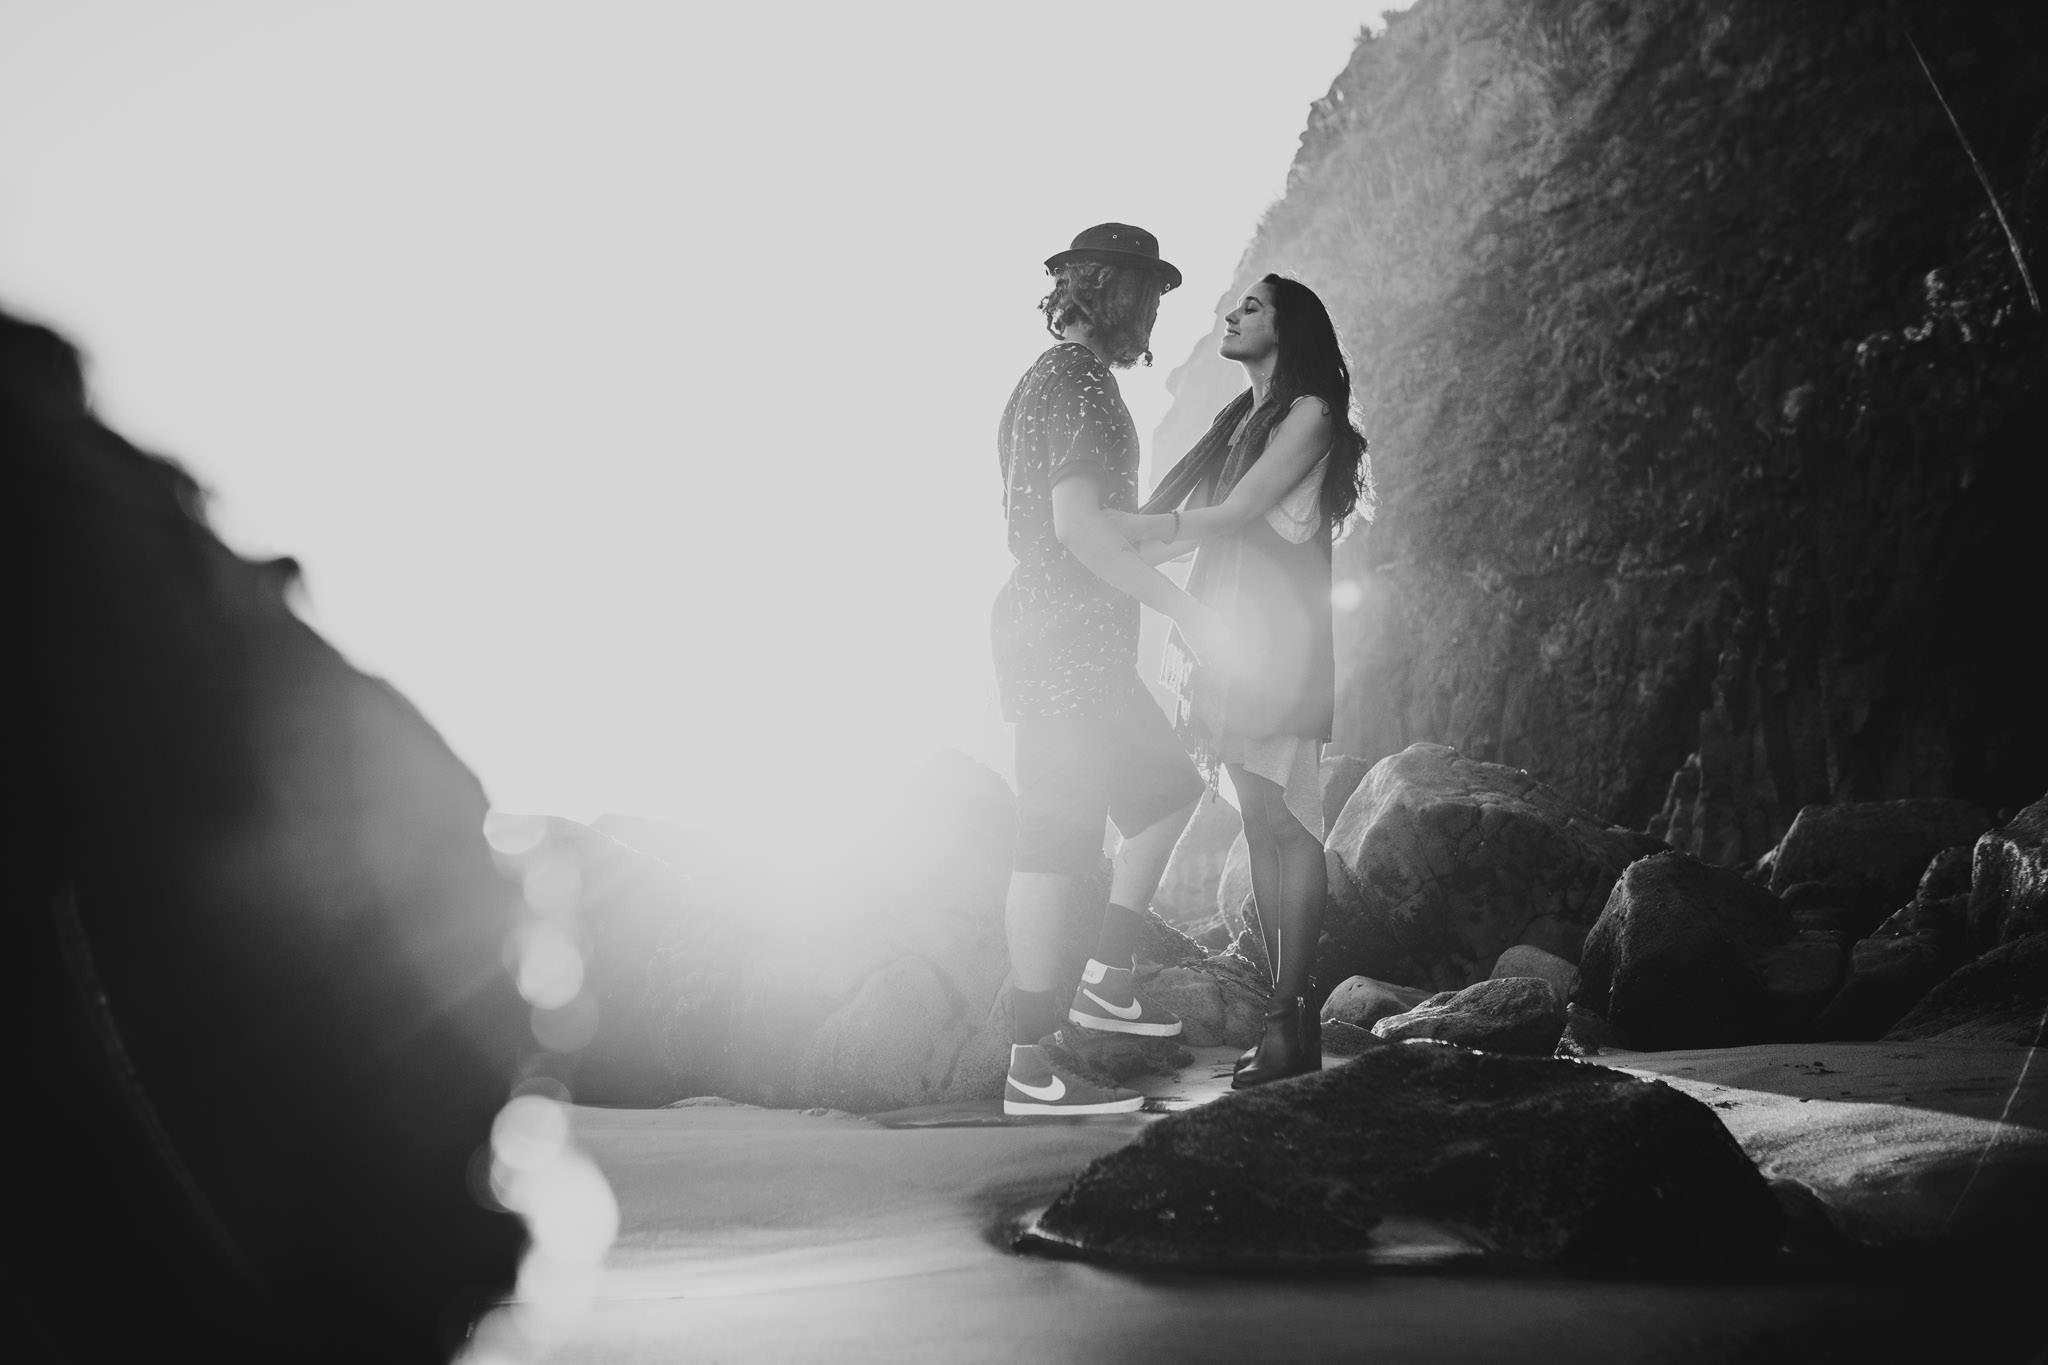 wedding photographer hamilton new zealand 1019 8